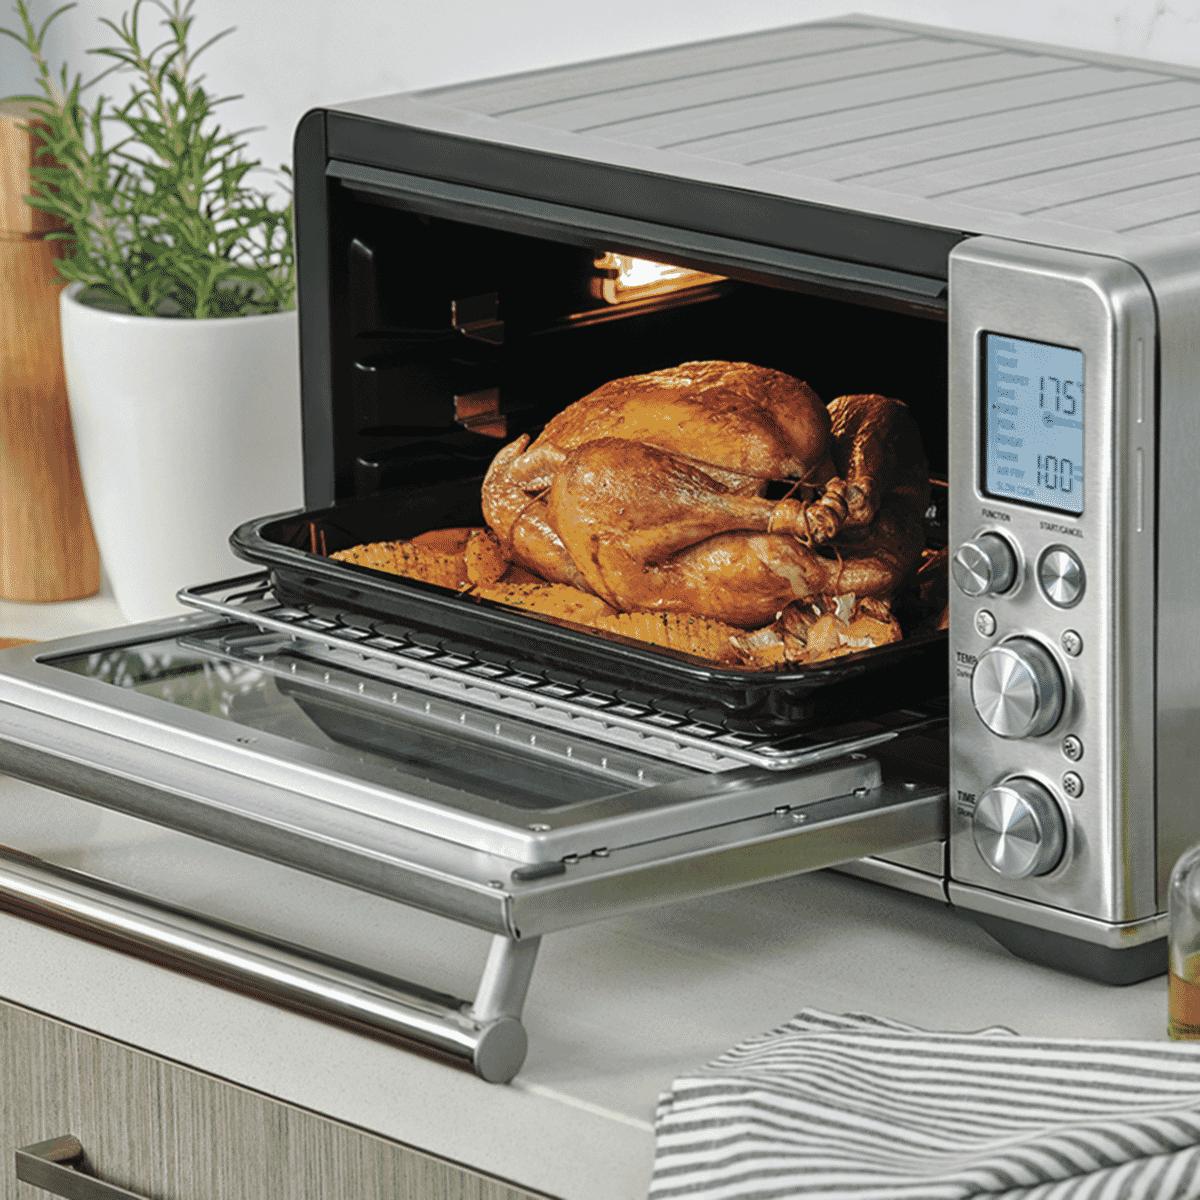 New Breville Bov860bss4jan1 The Smart Oven Air Fryer Ebay